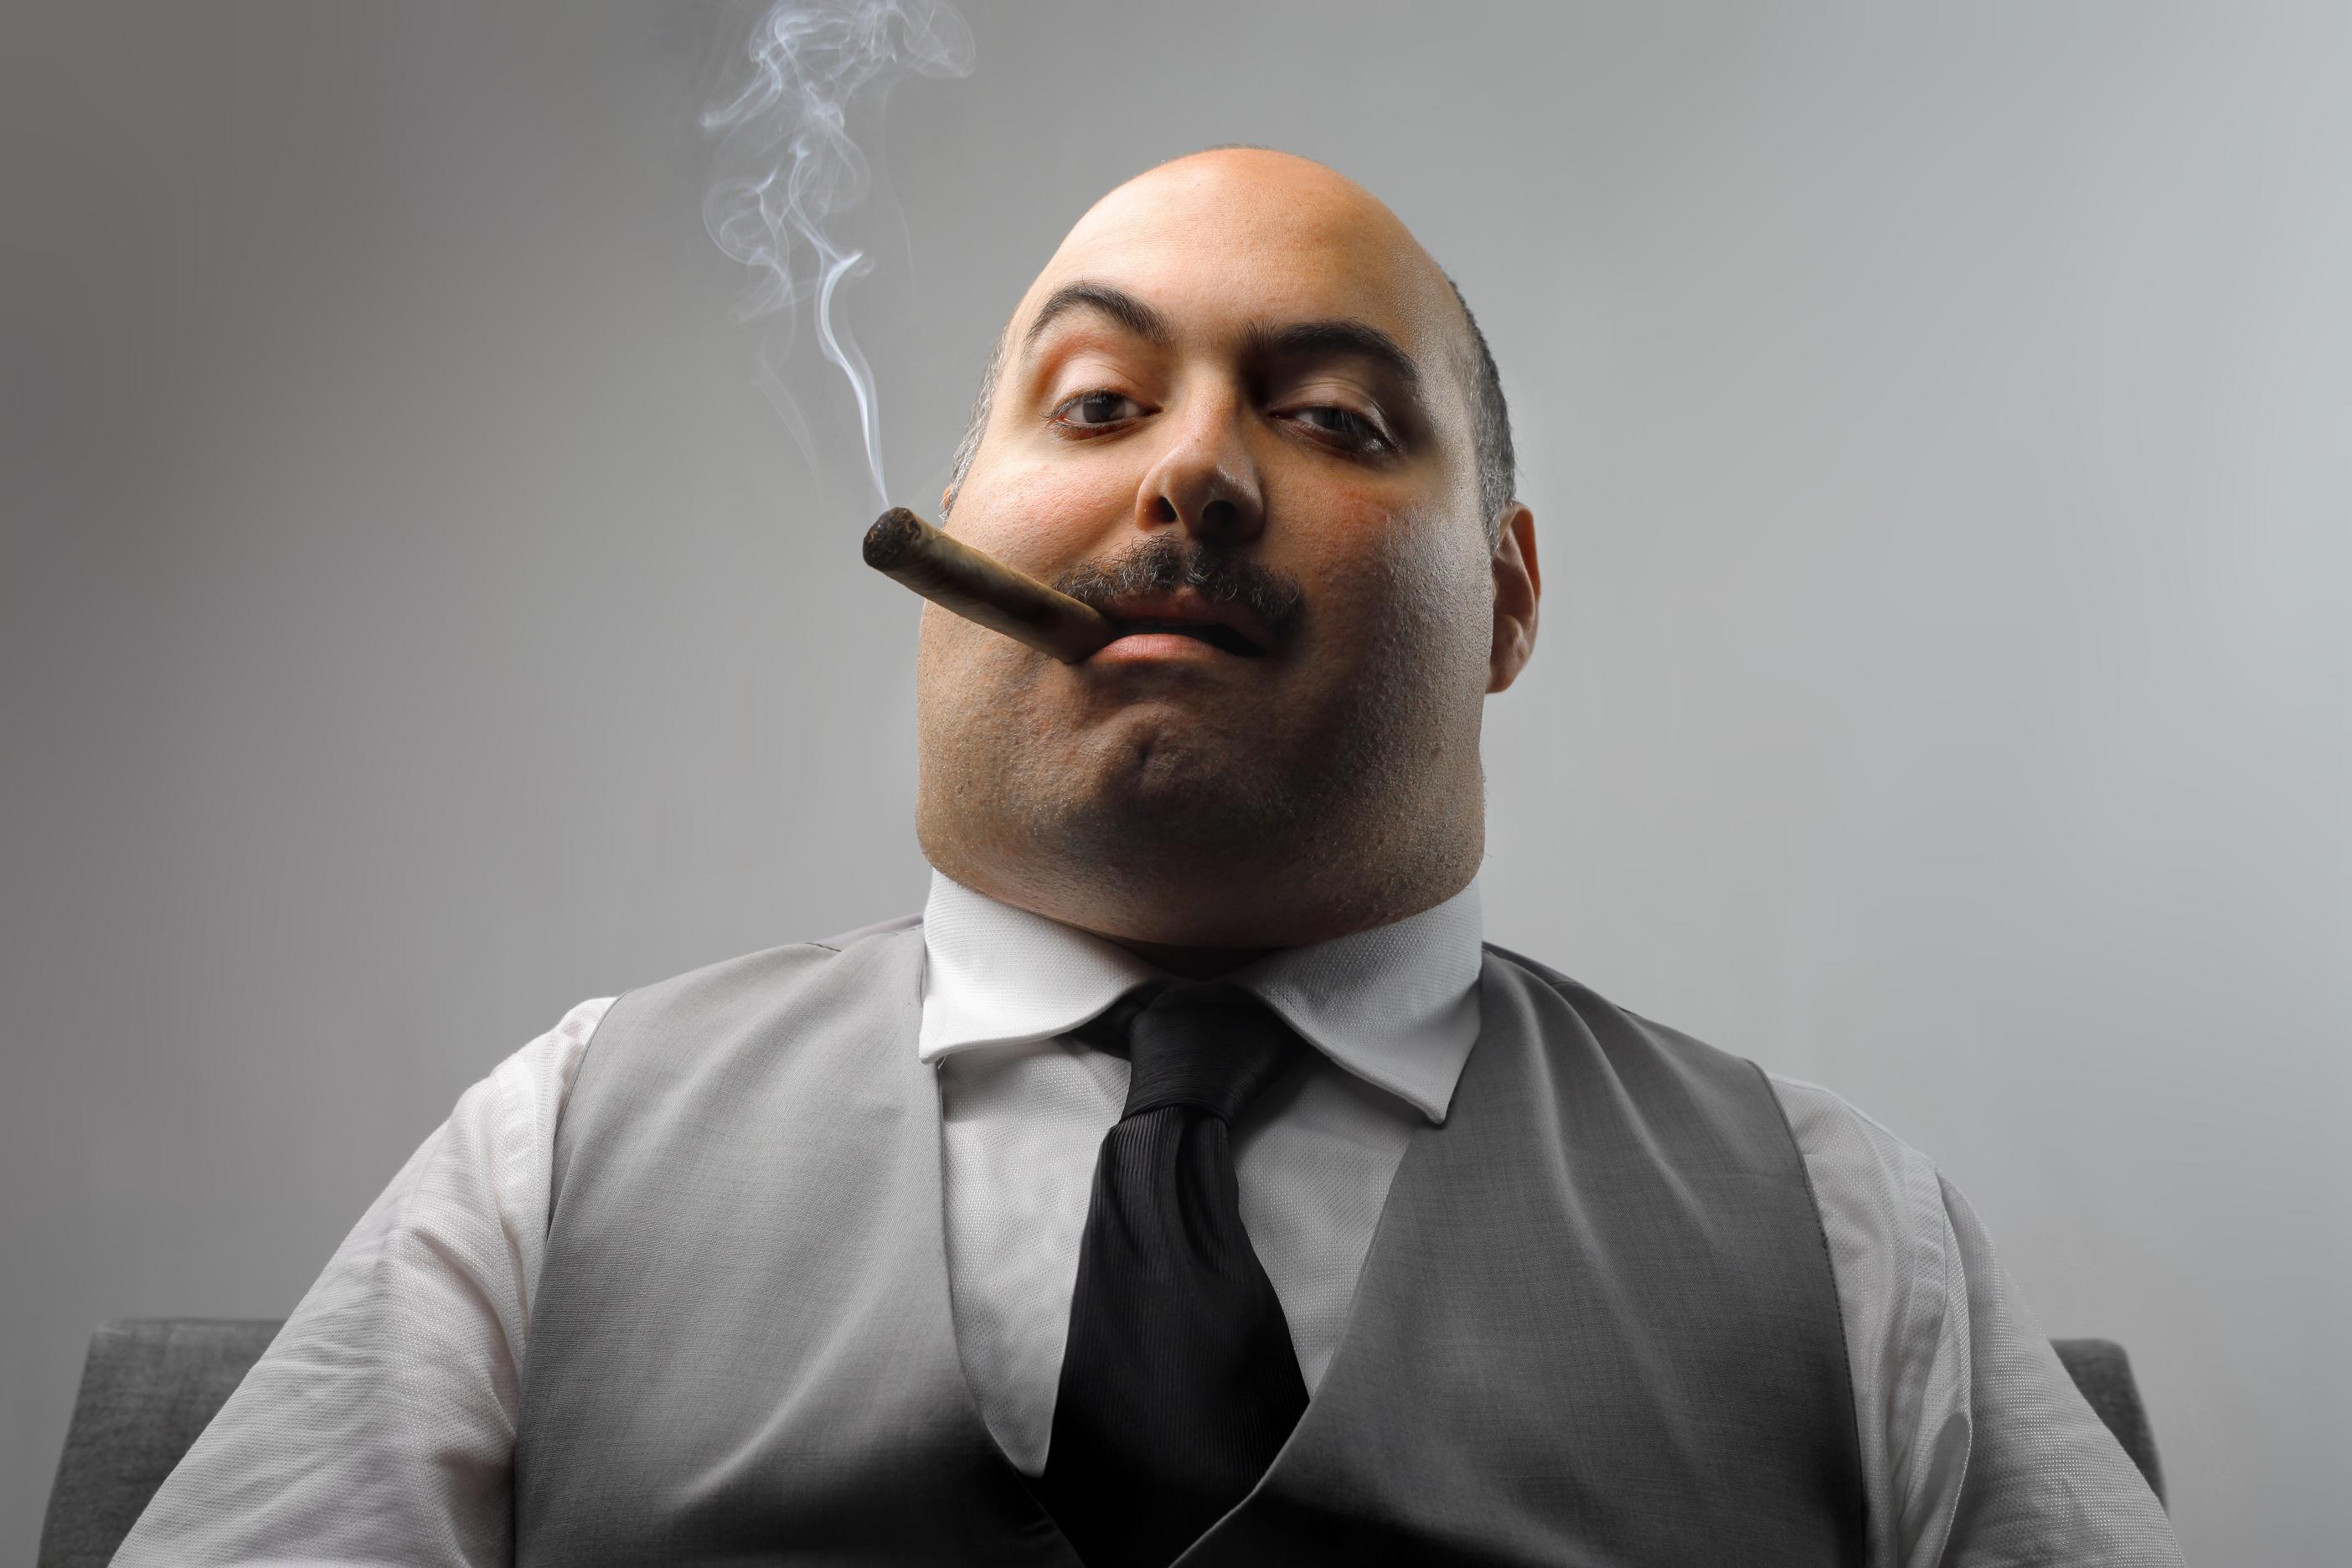 http://thepeoplegroup.com/wp-content/uploads/2013/04/bad-boss-smoking-cigar.jpg